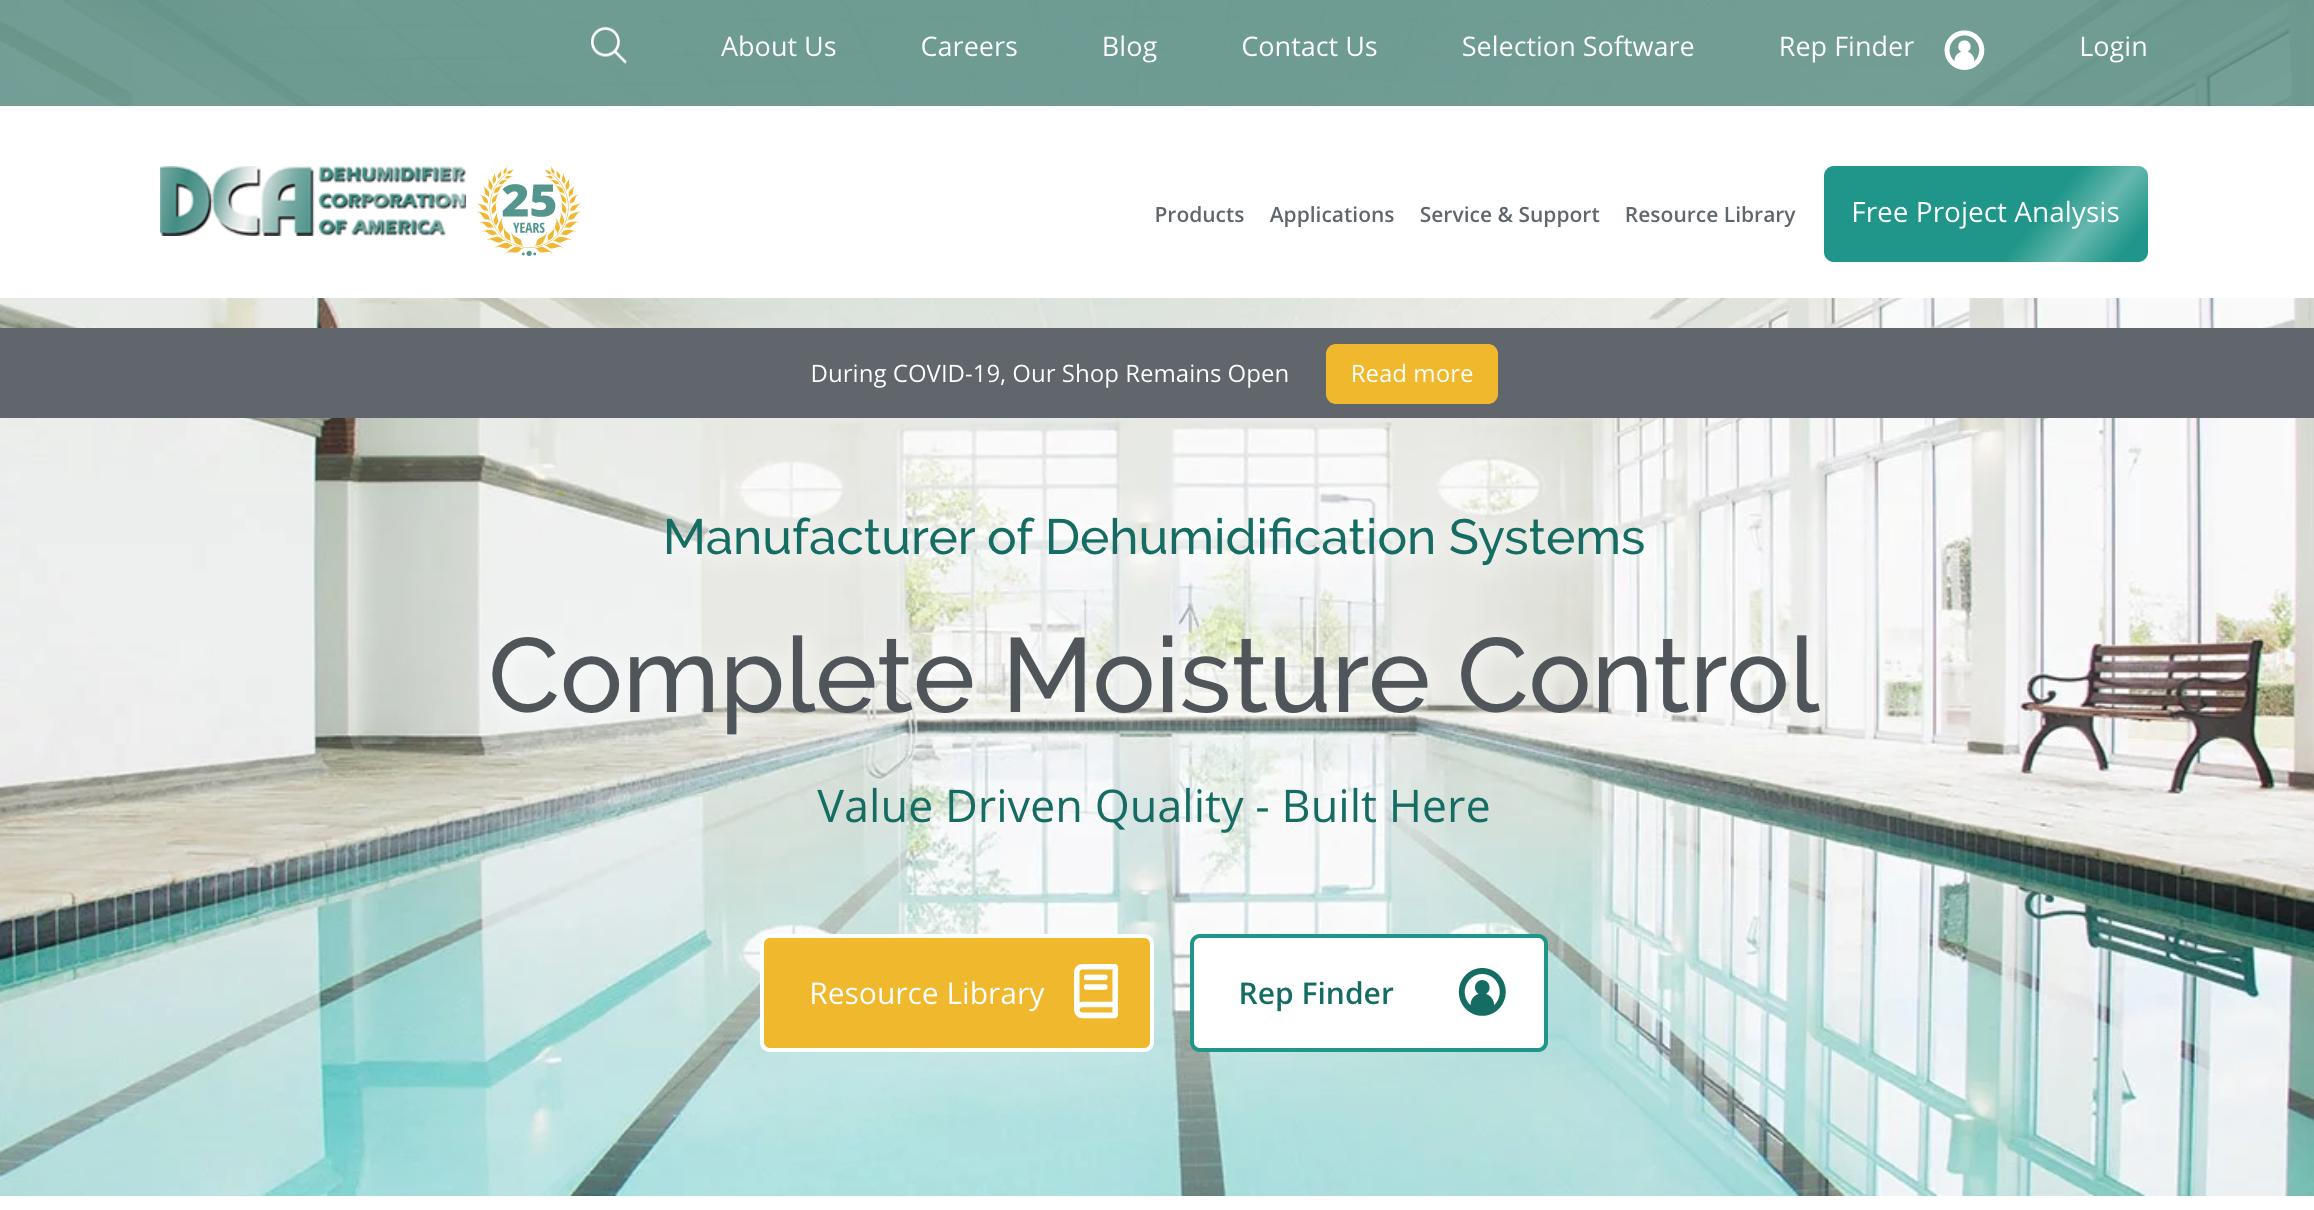 Dehumidifier Corp Website